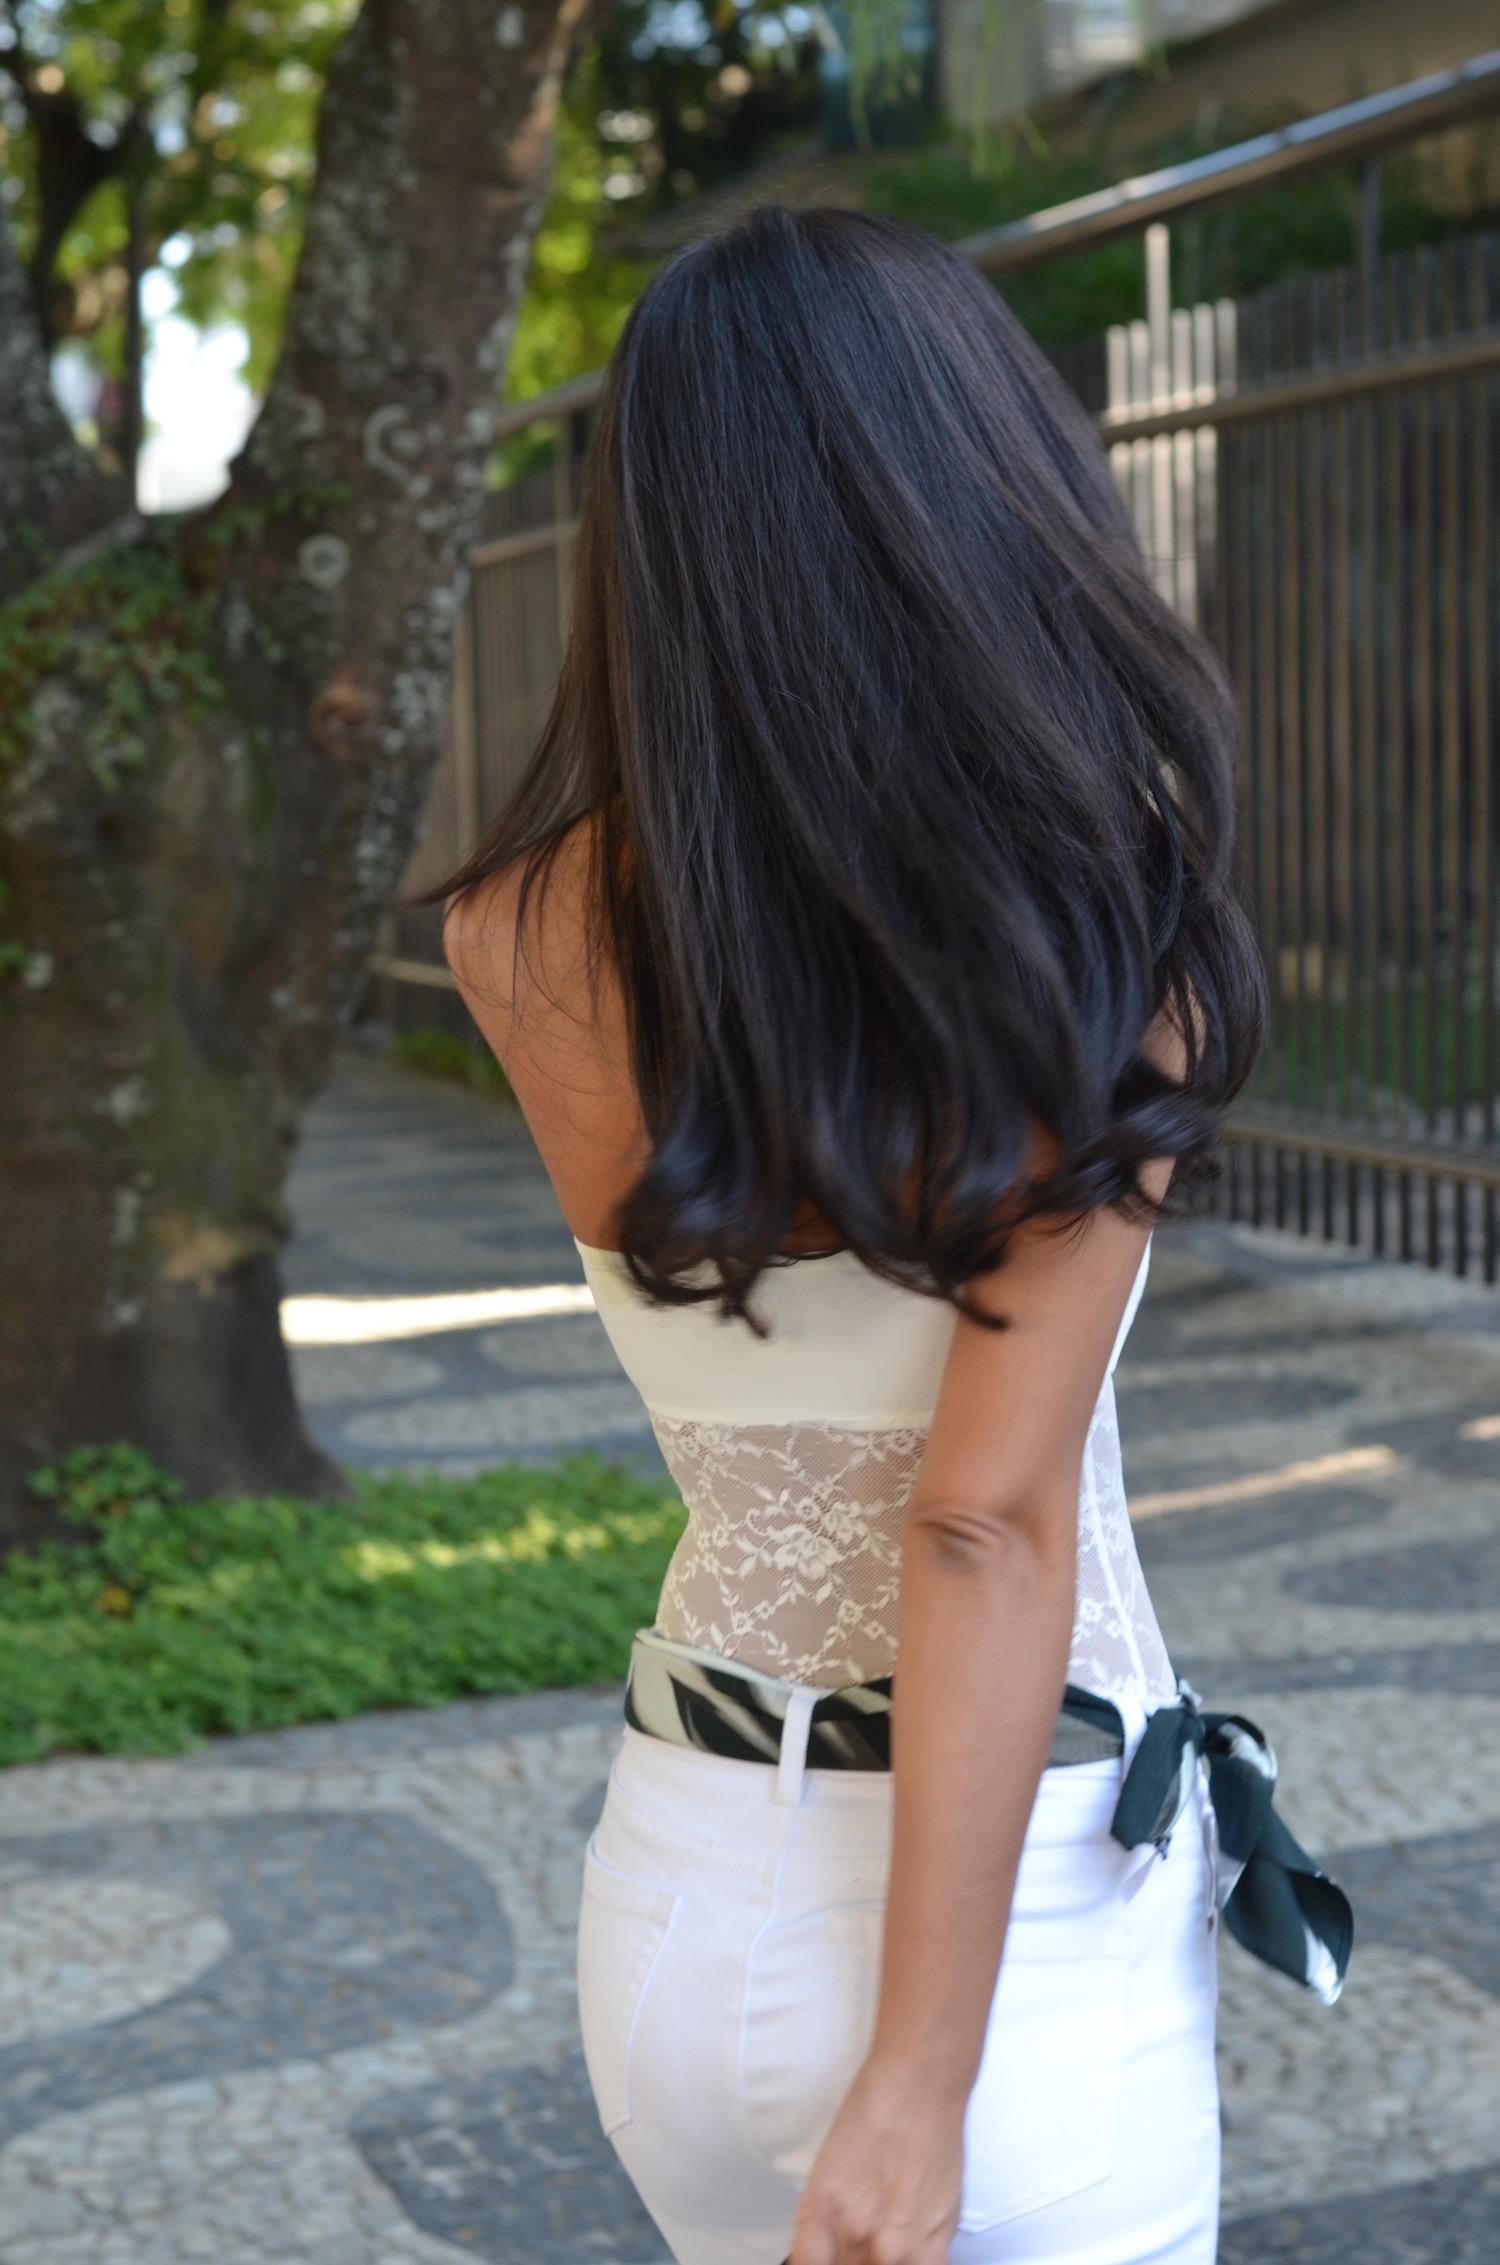 look-do-dia-branco-body-roberta-beta-pinheiro-blogueira-rio-dejaneiro-7